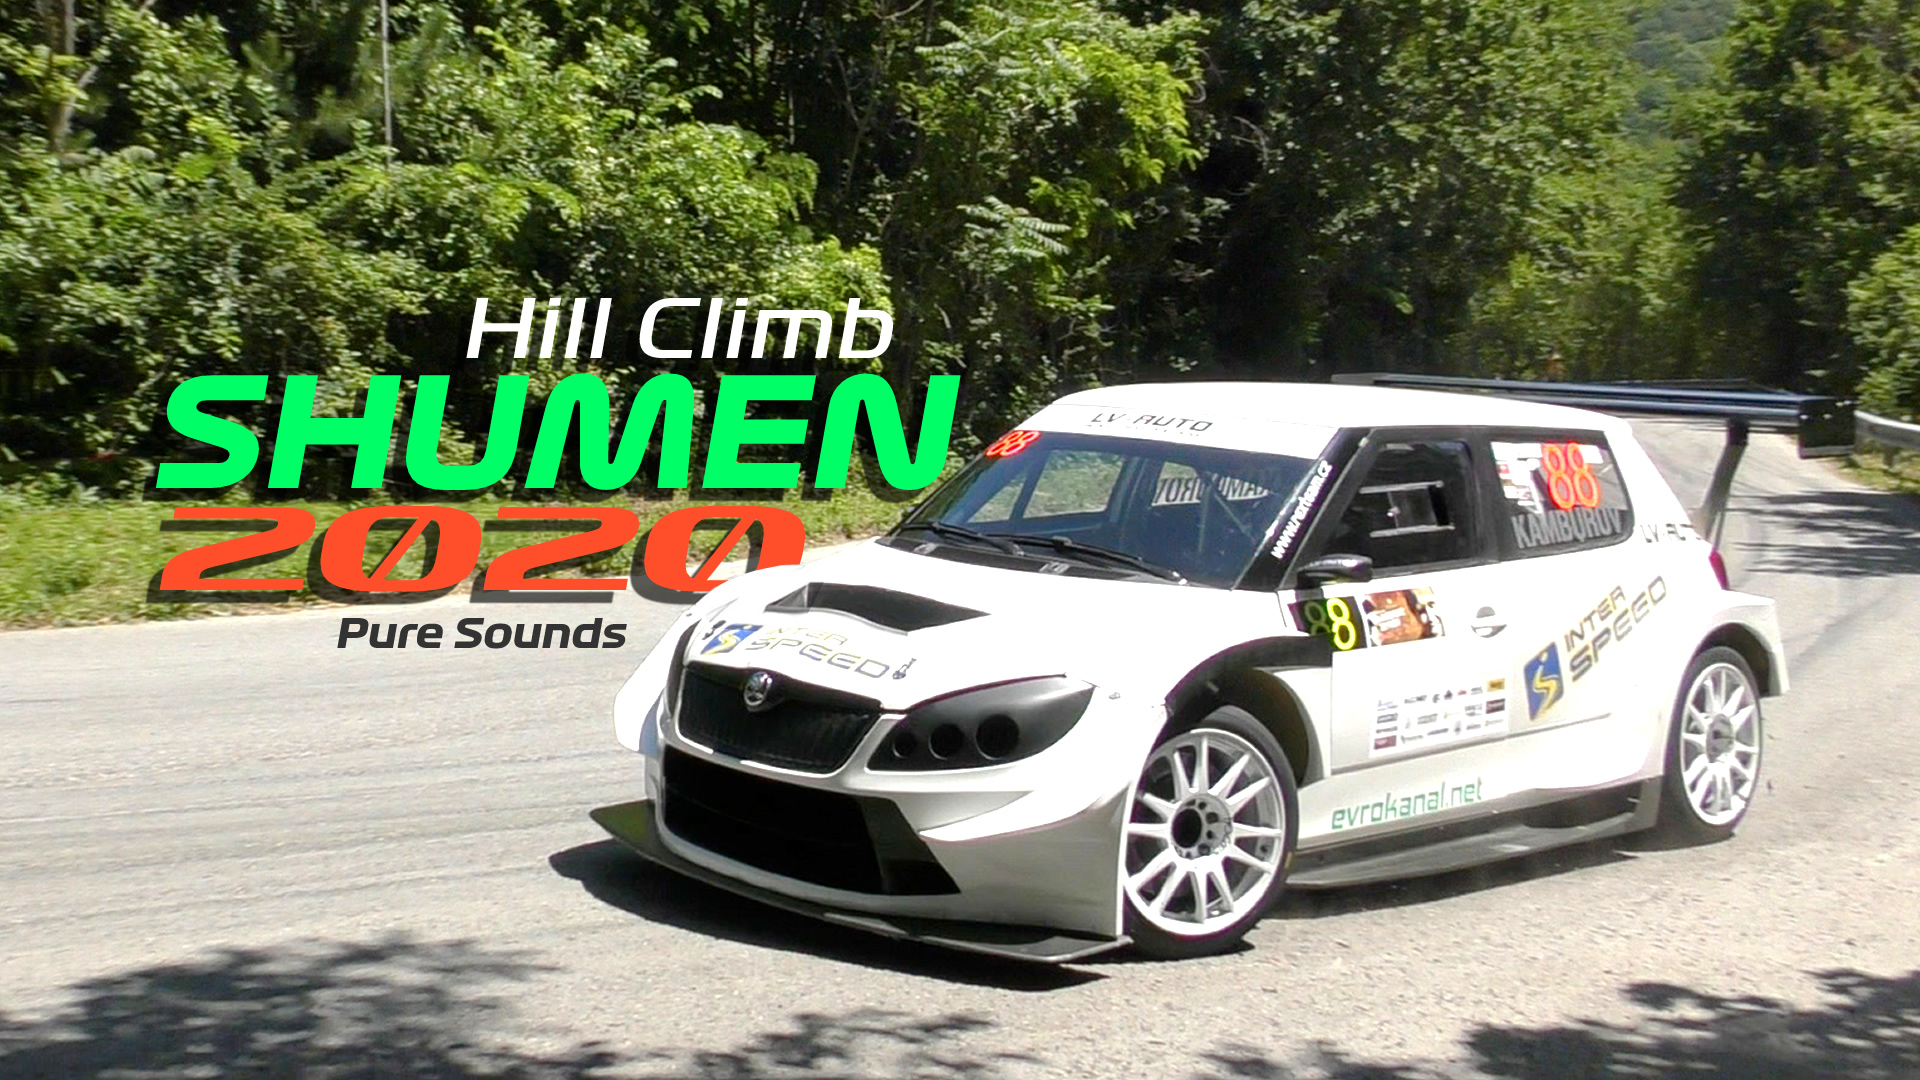 shumen-hill-climb